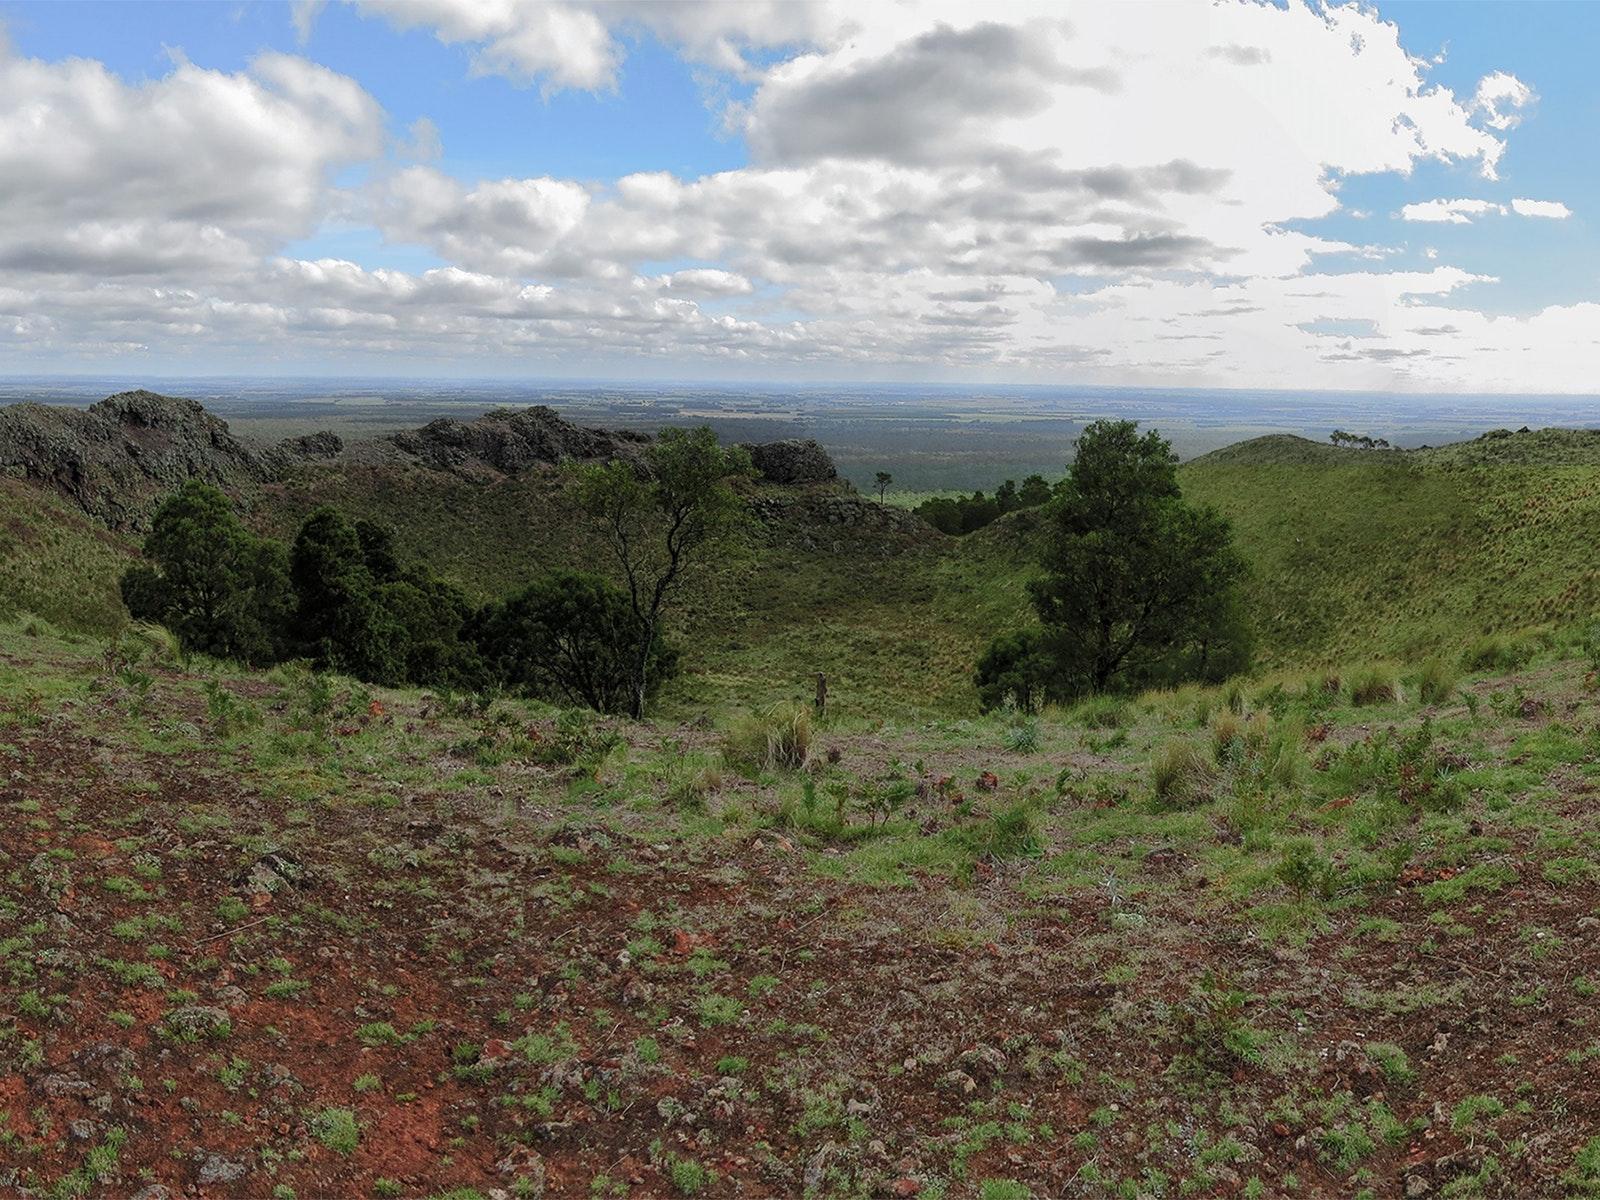 Mount Napier State Park